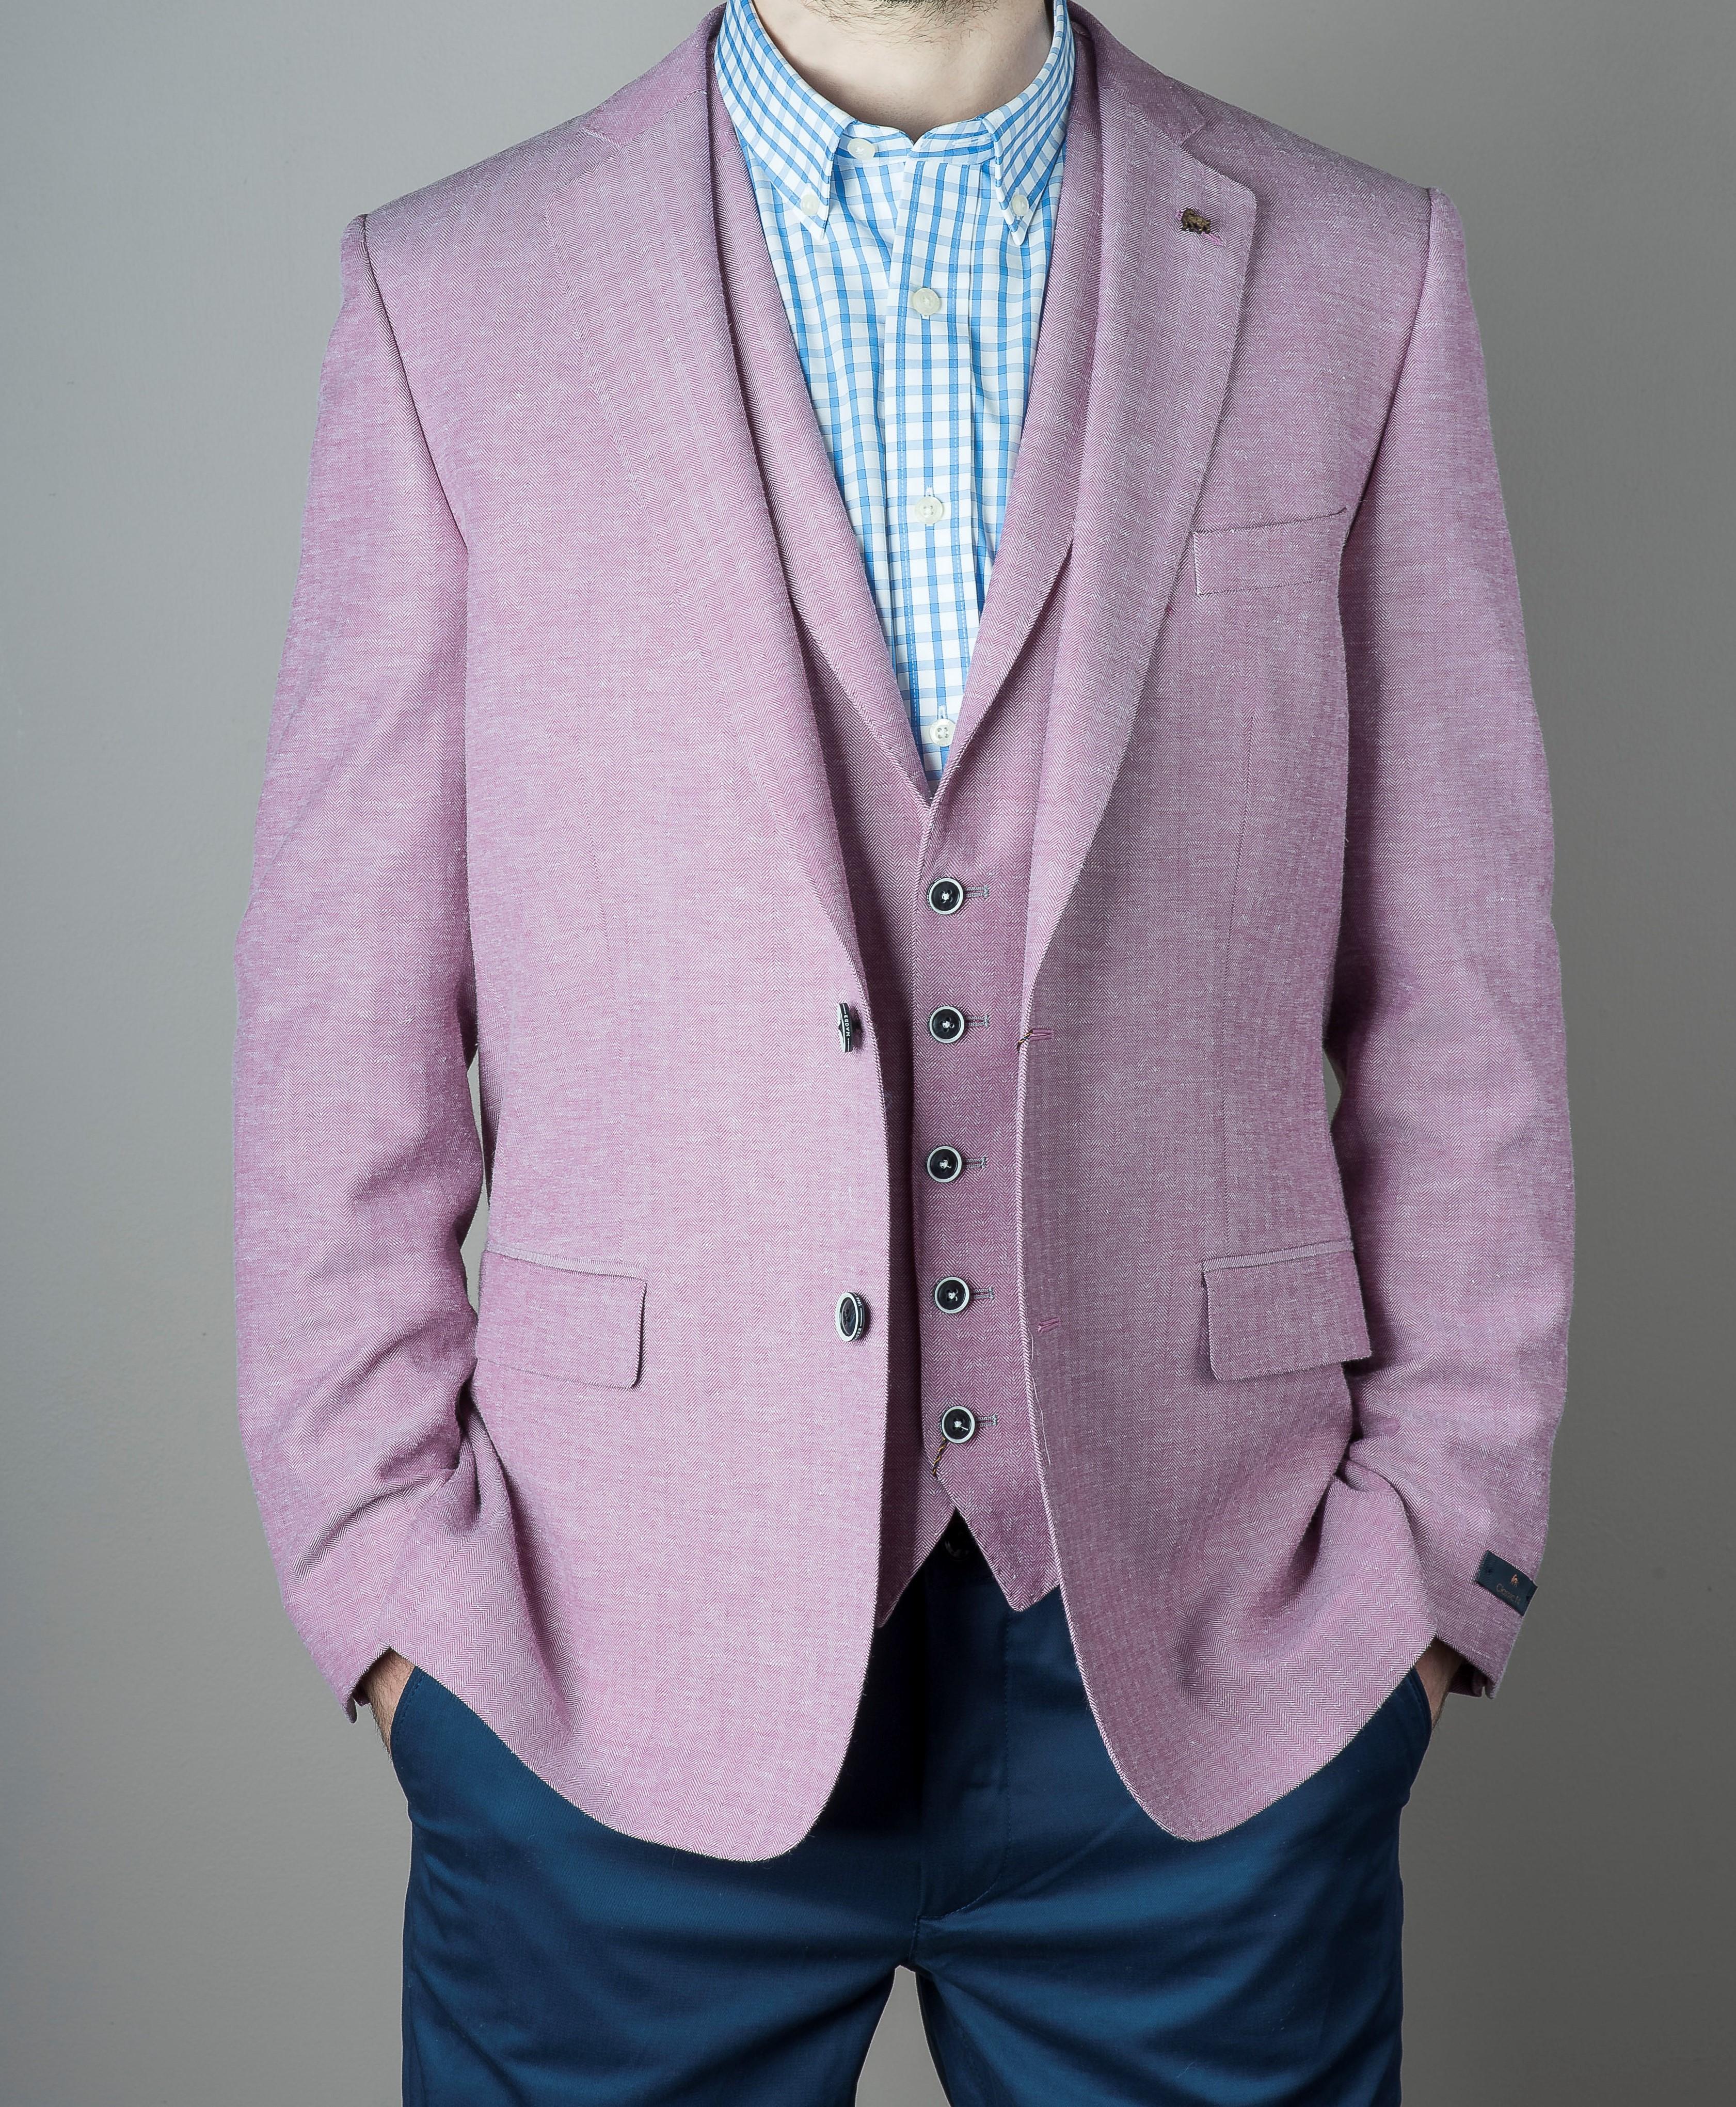 A fine weave – Magee Menswear